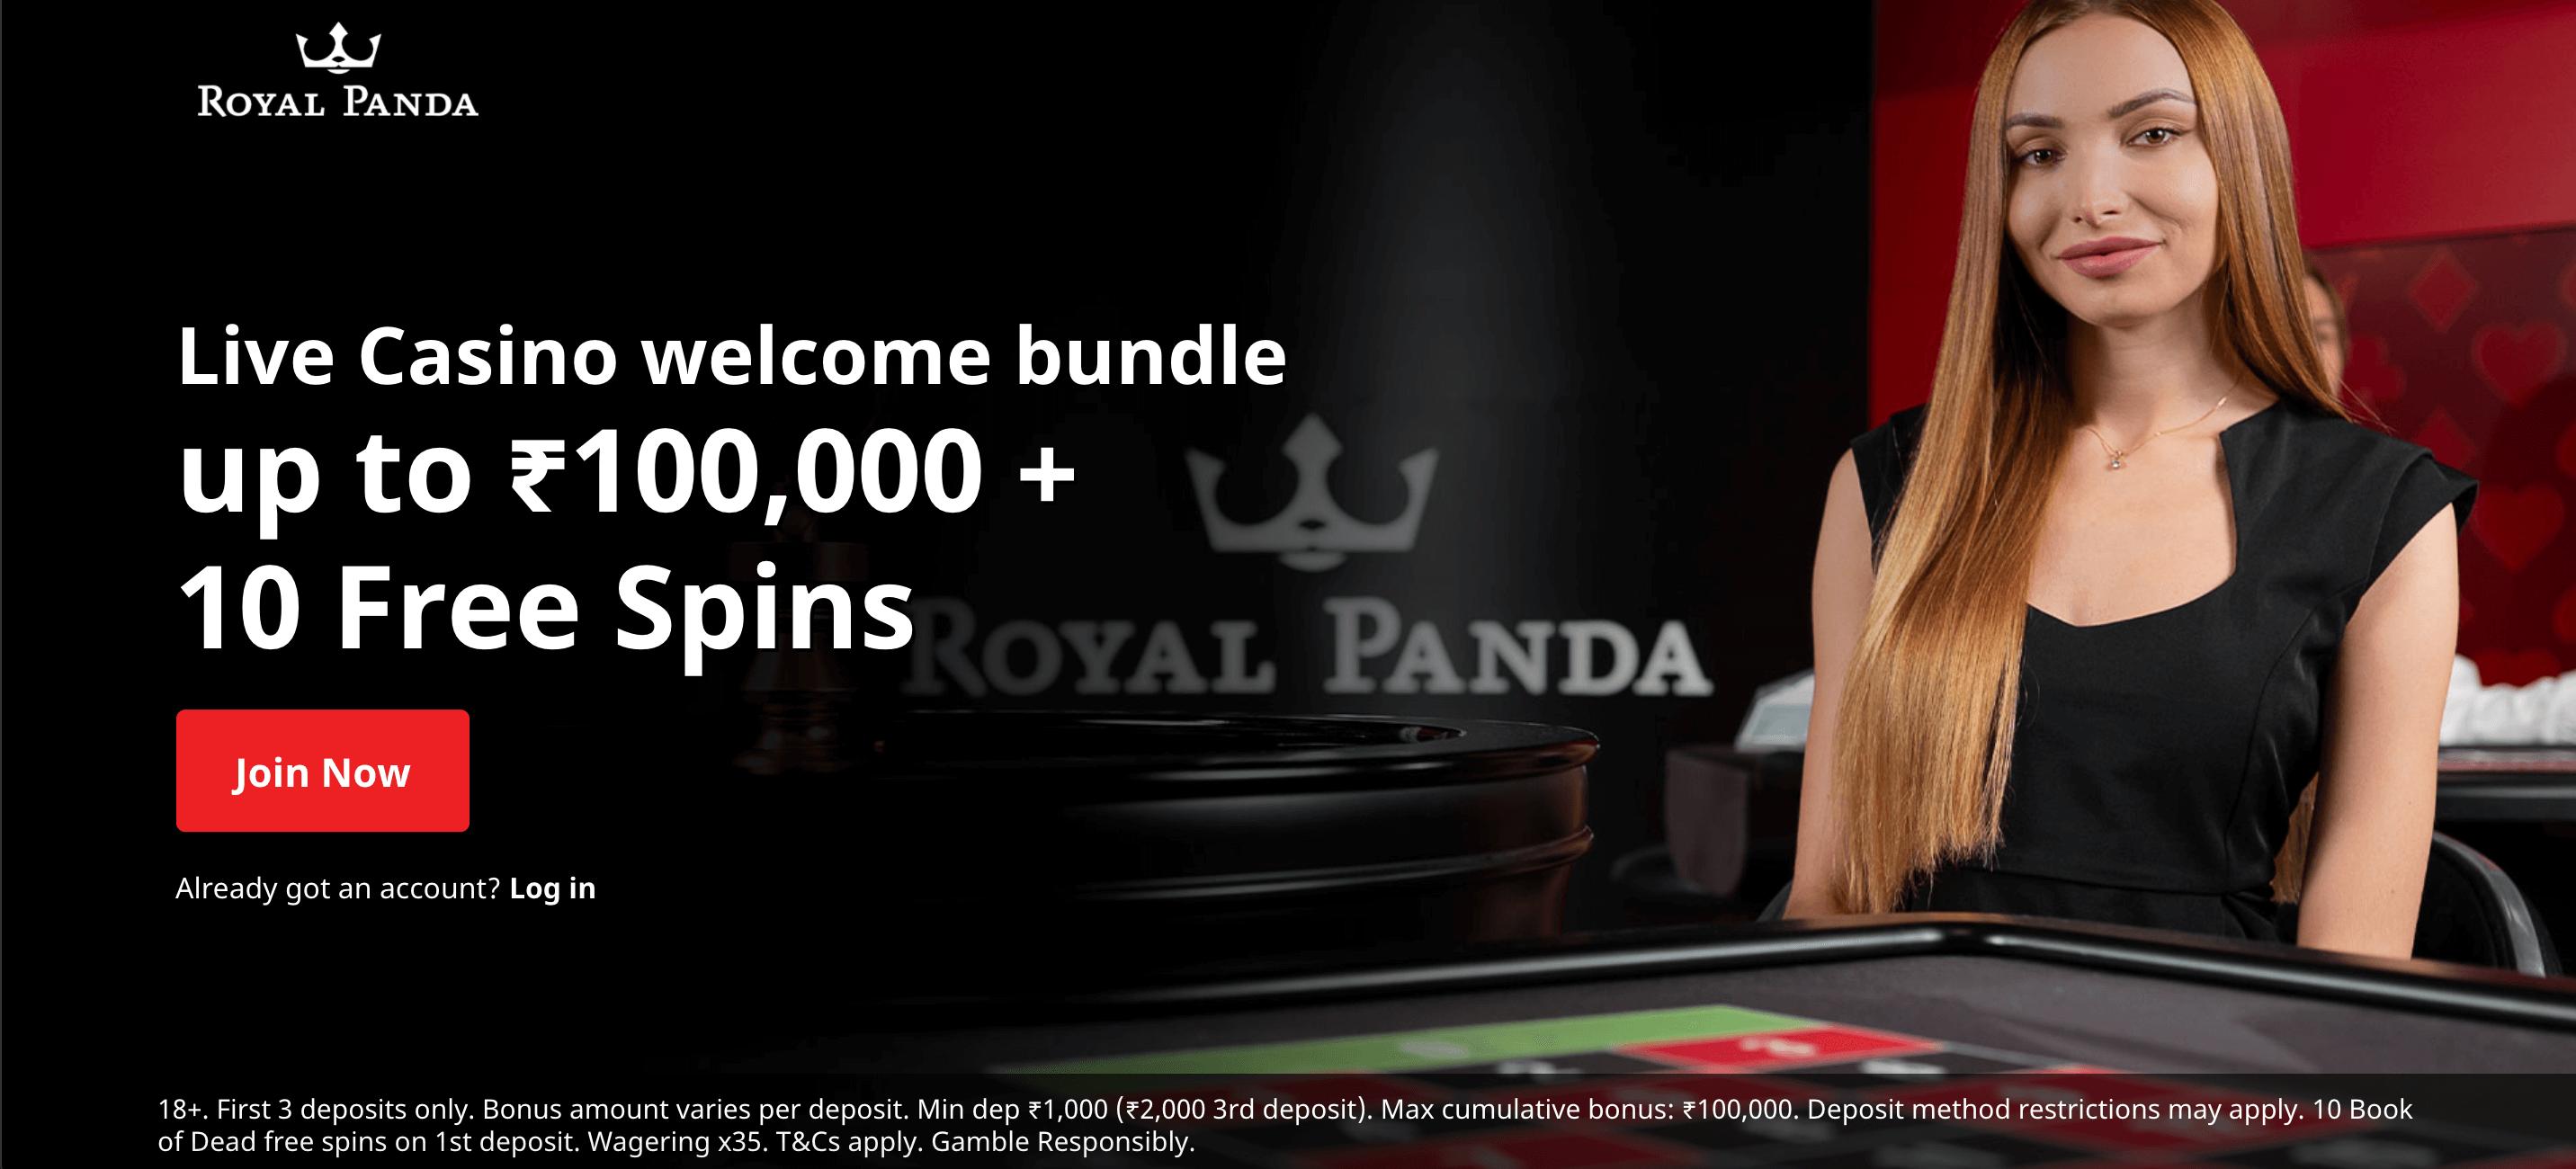 screenshot of current Royal Panda welcome offer